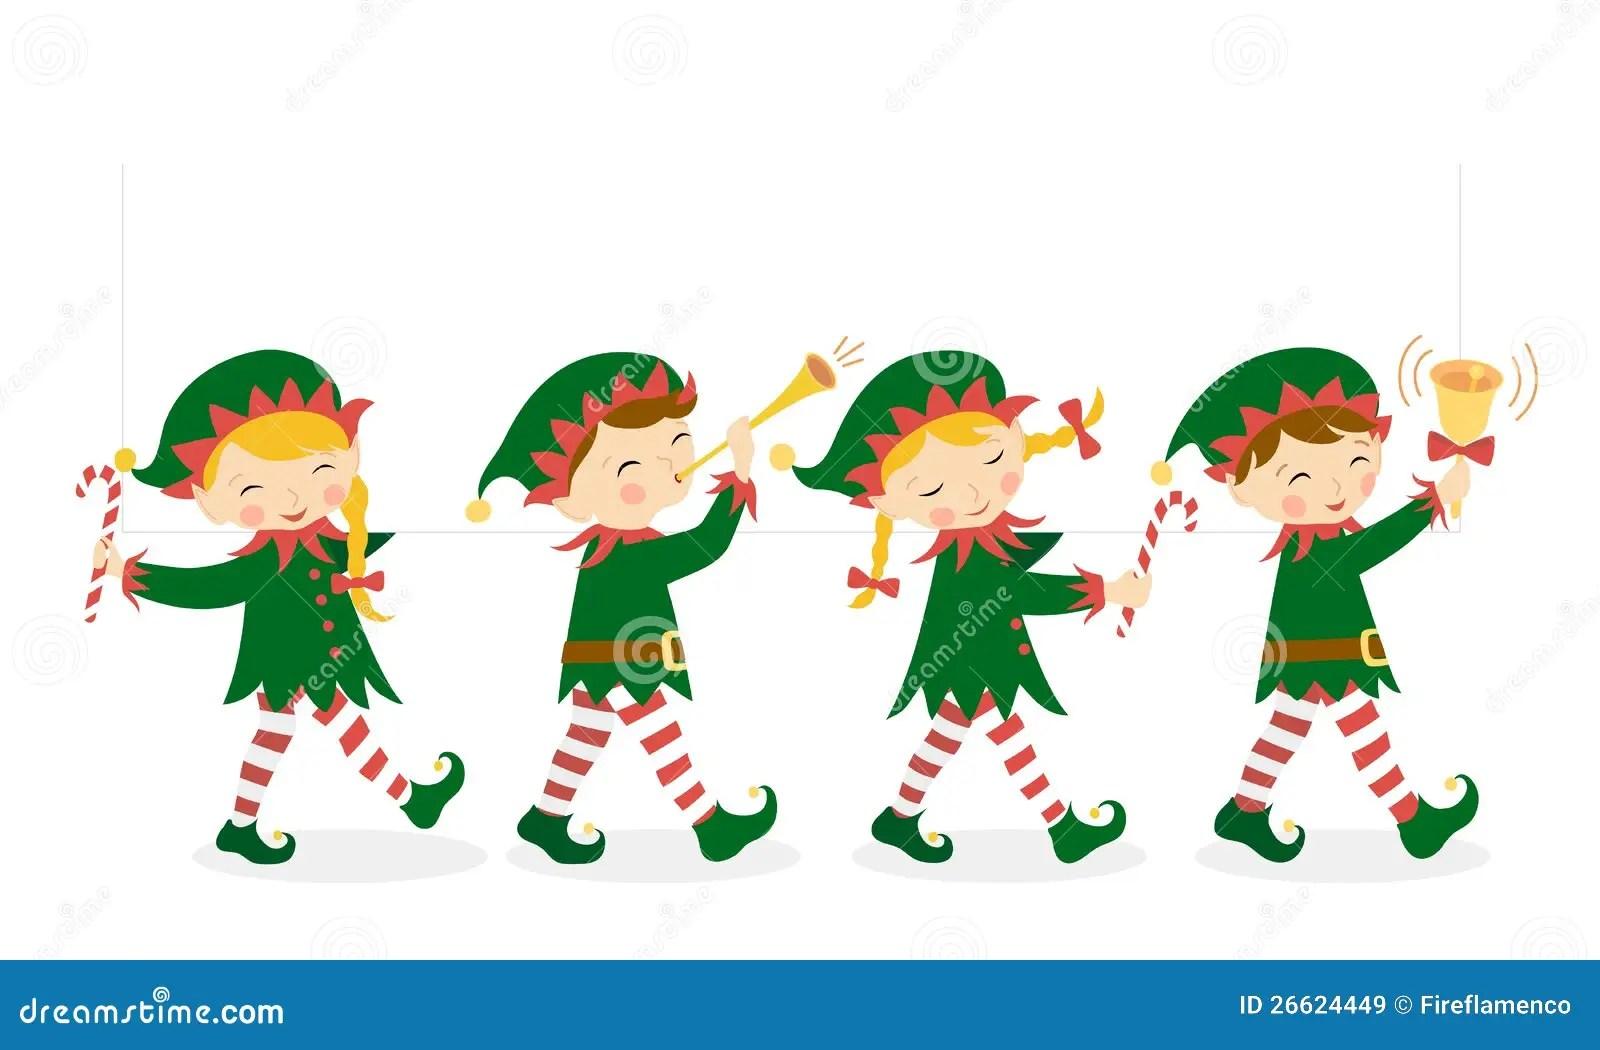 hight resolution of christmas elves